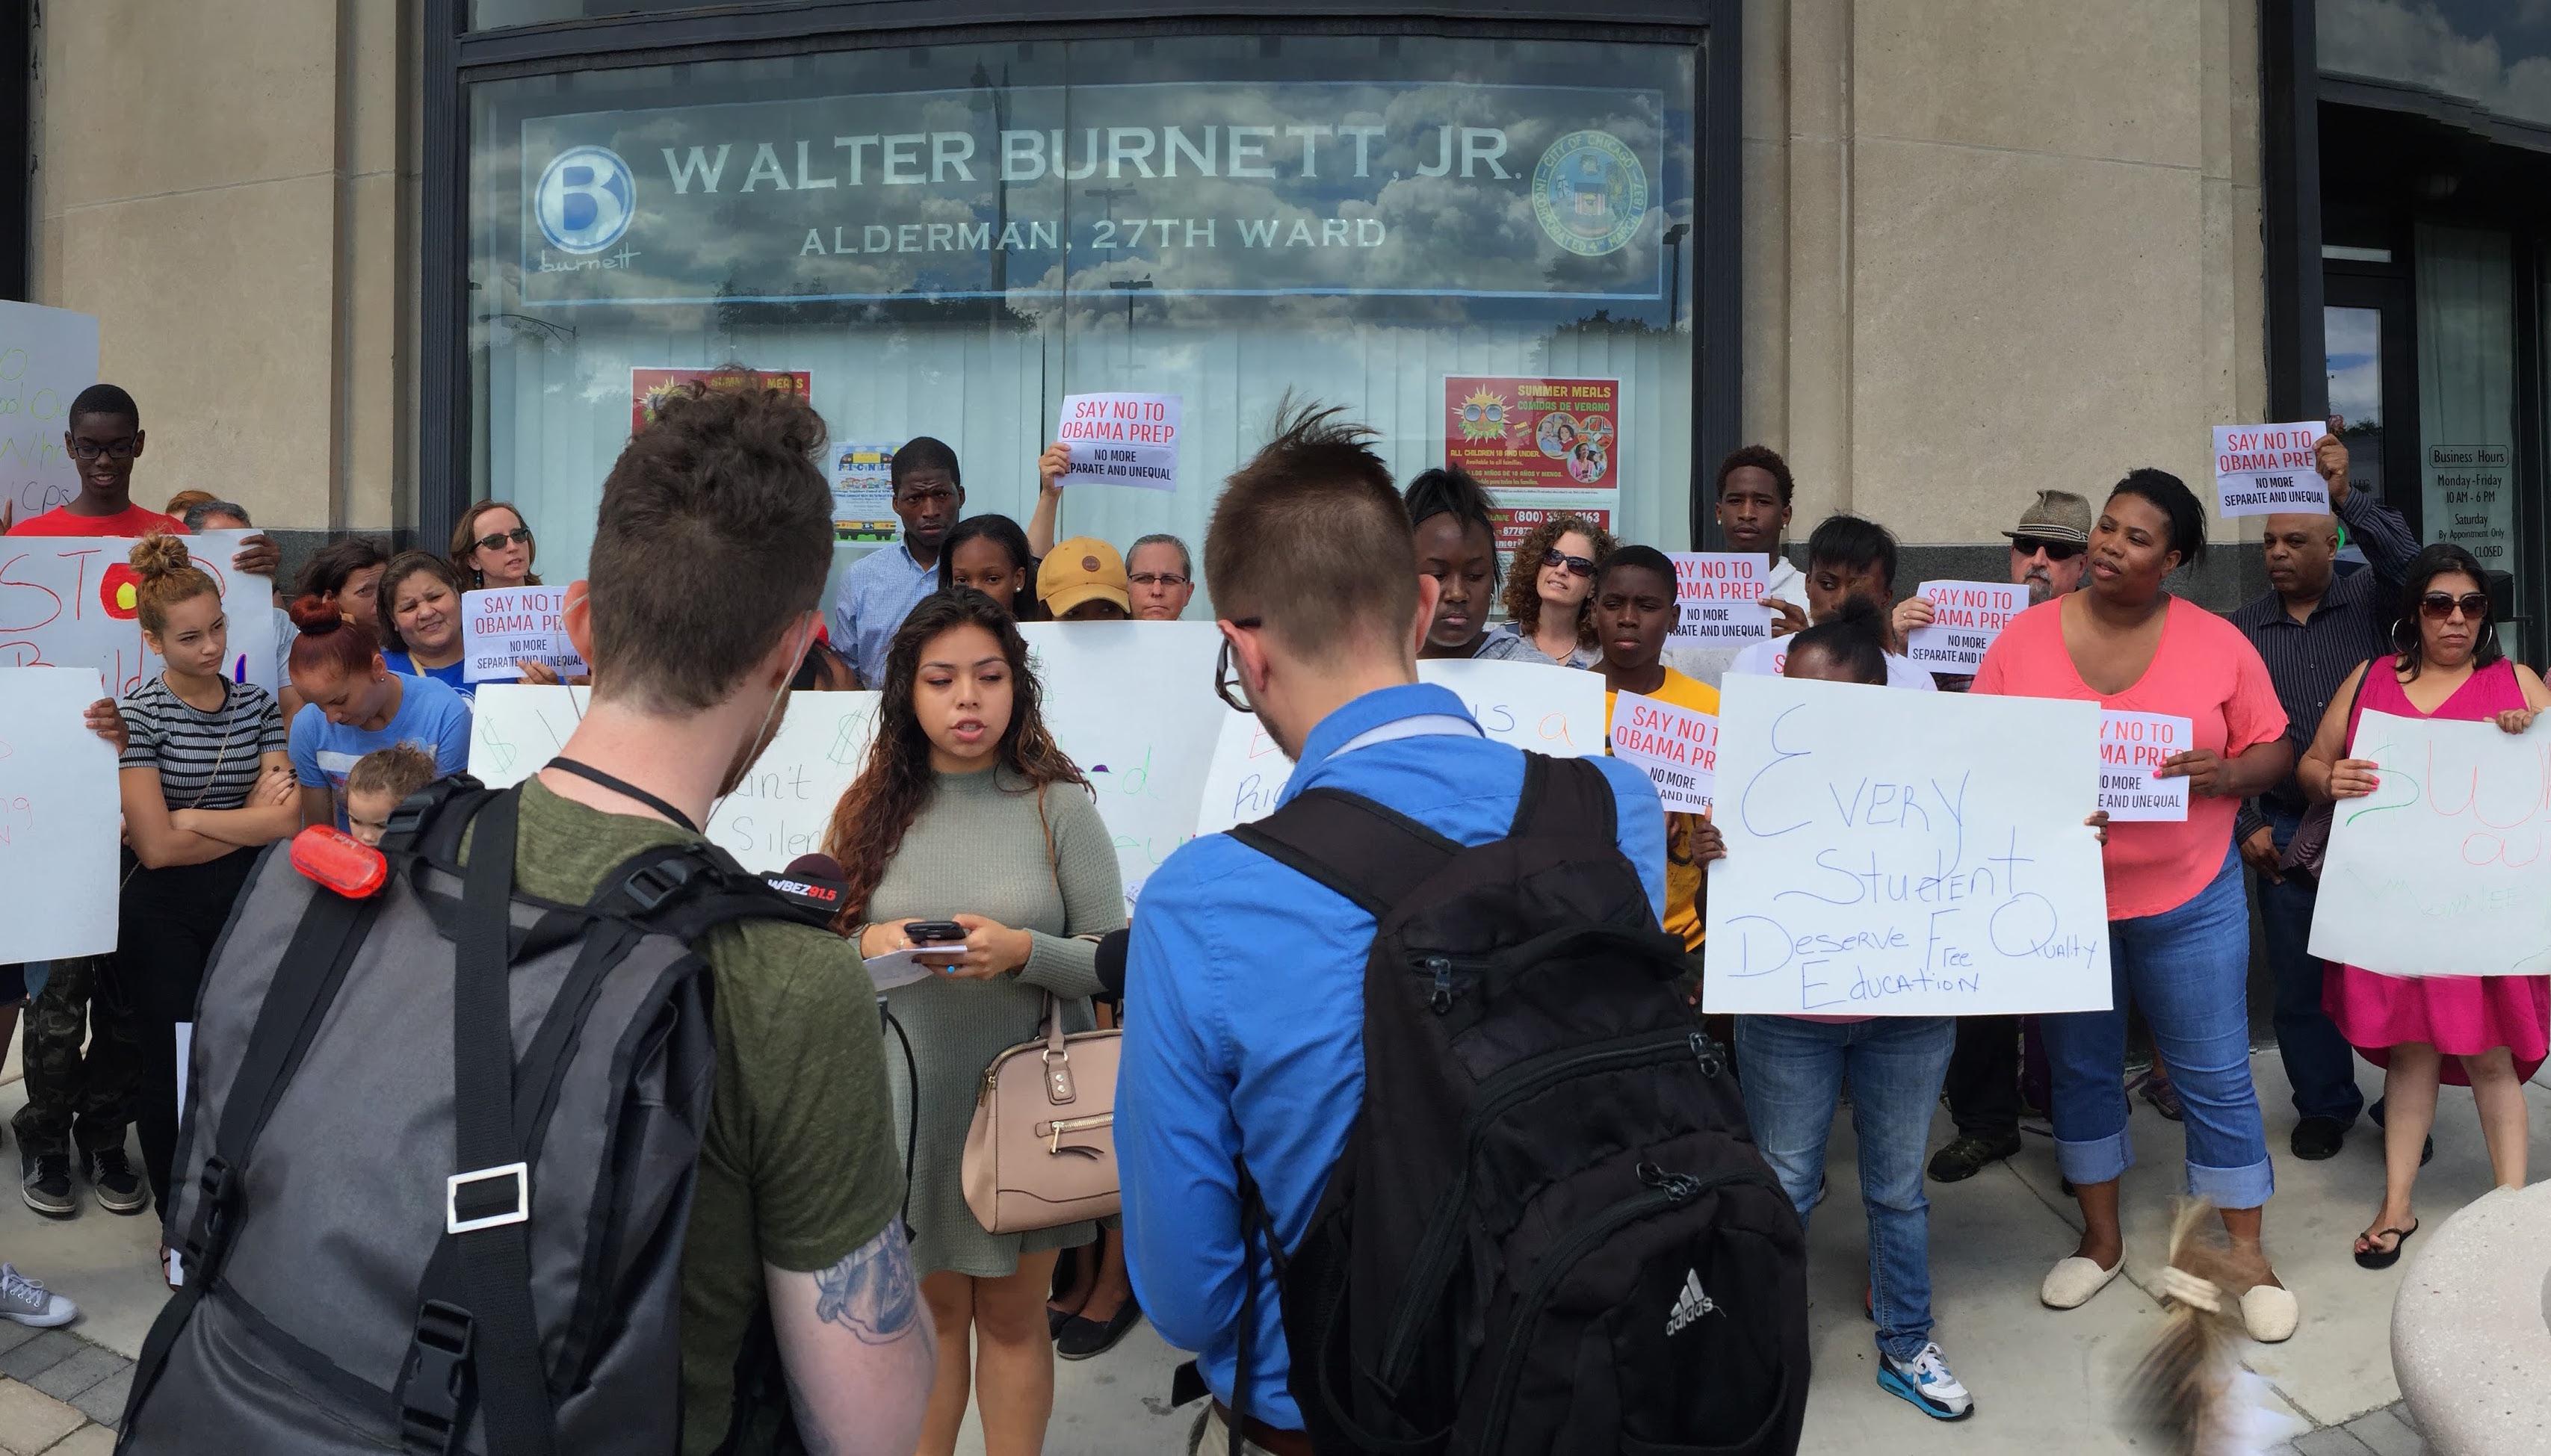 Rally outside Alderman Burnett's office, July 2016